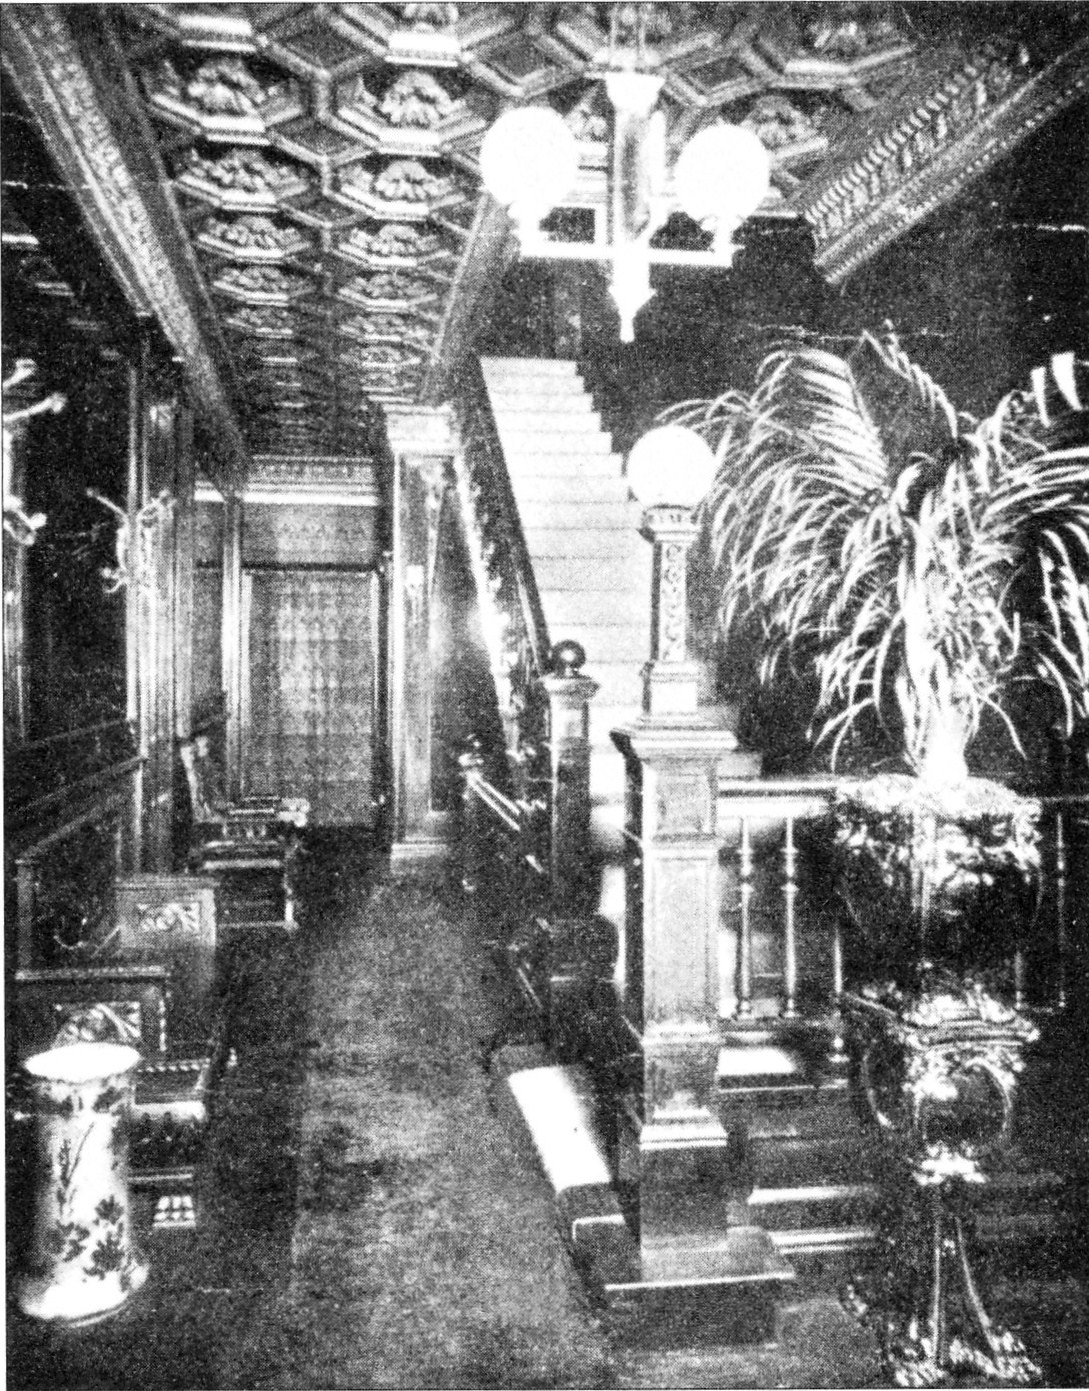 Everleigh_Club_-_Hallway_to_Entrance_02